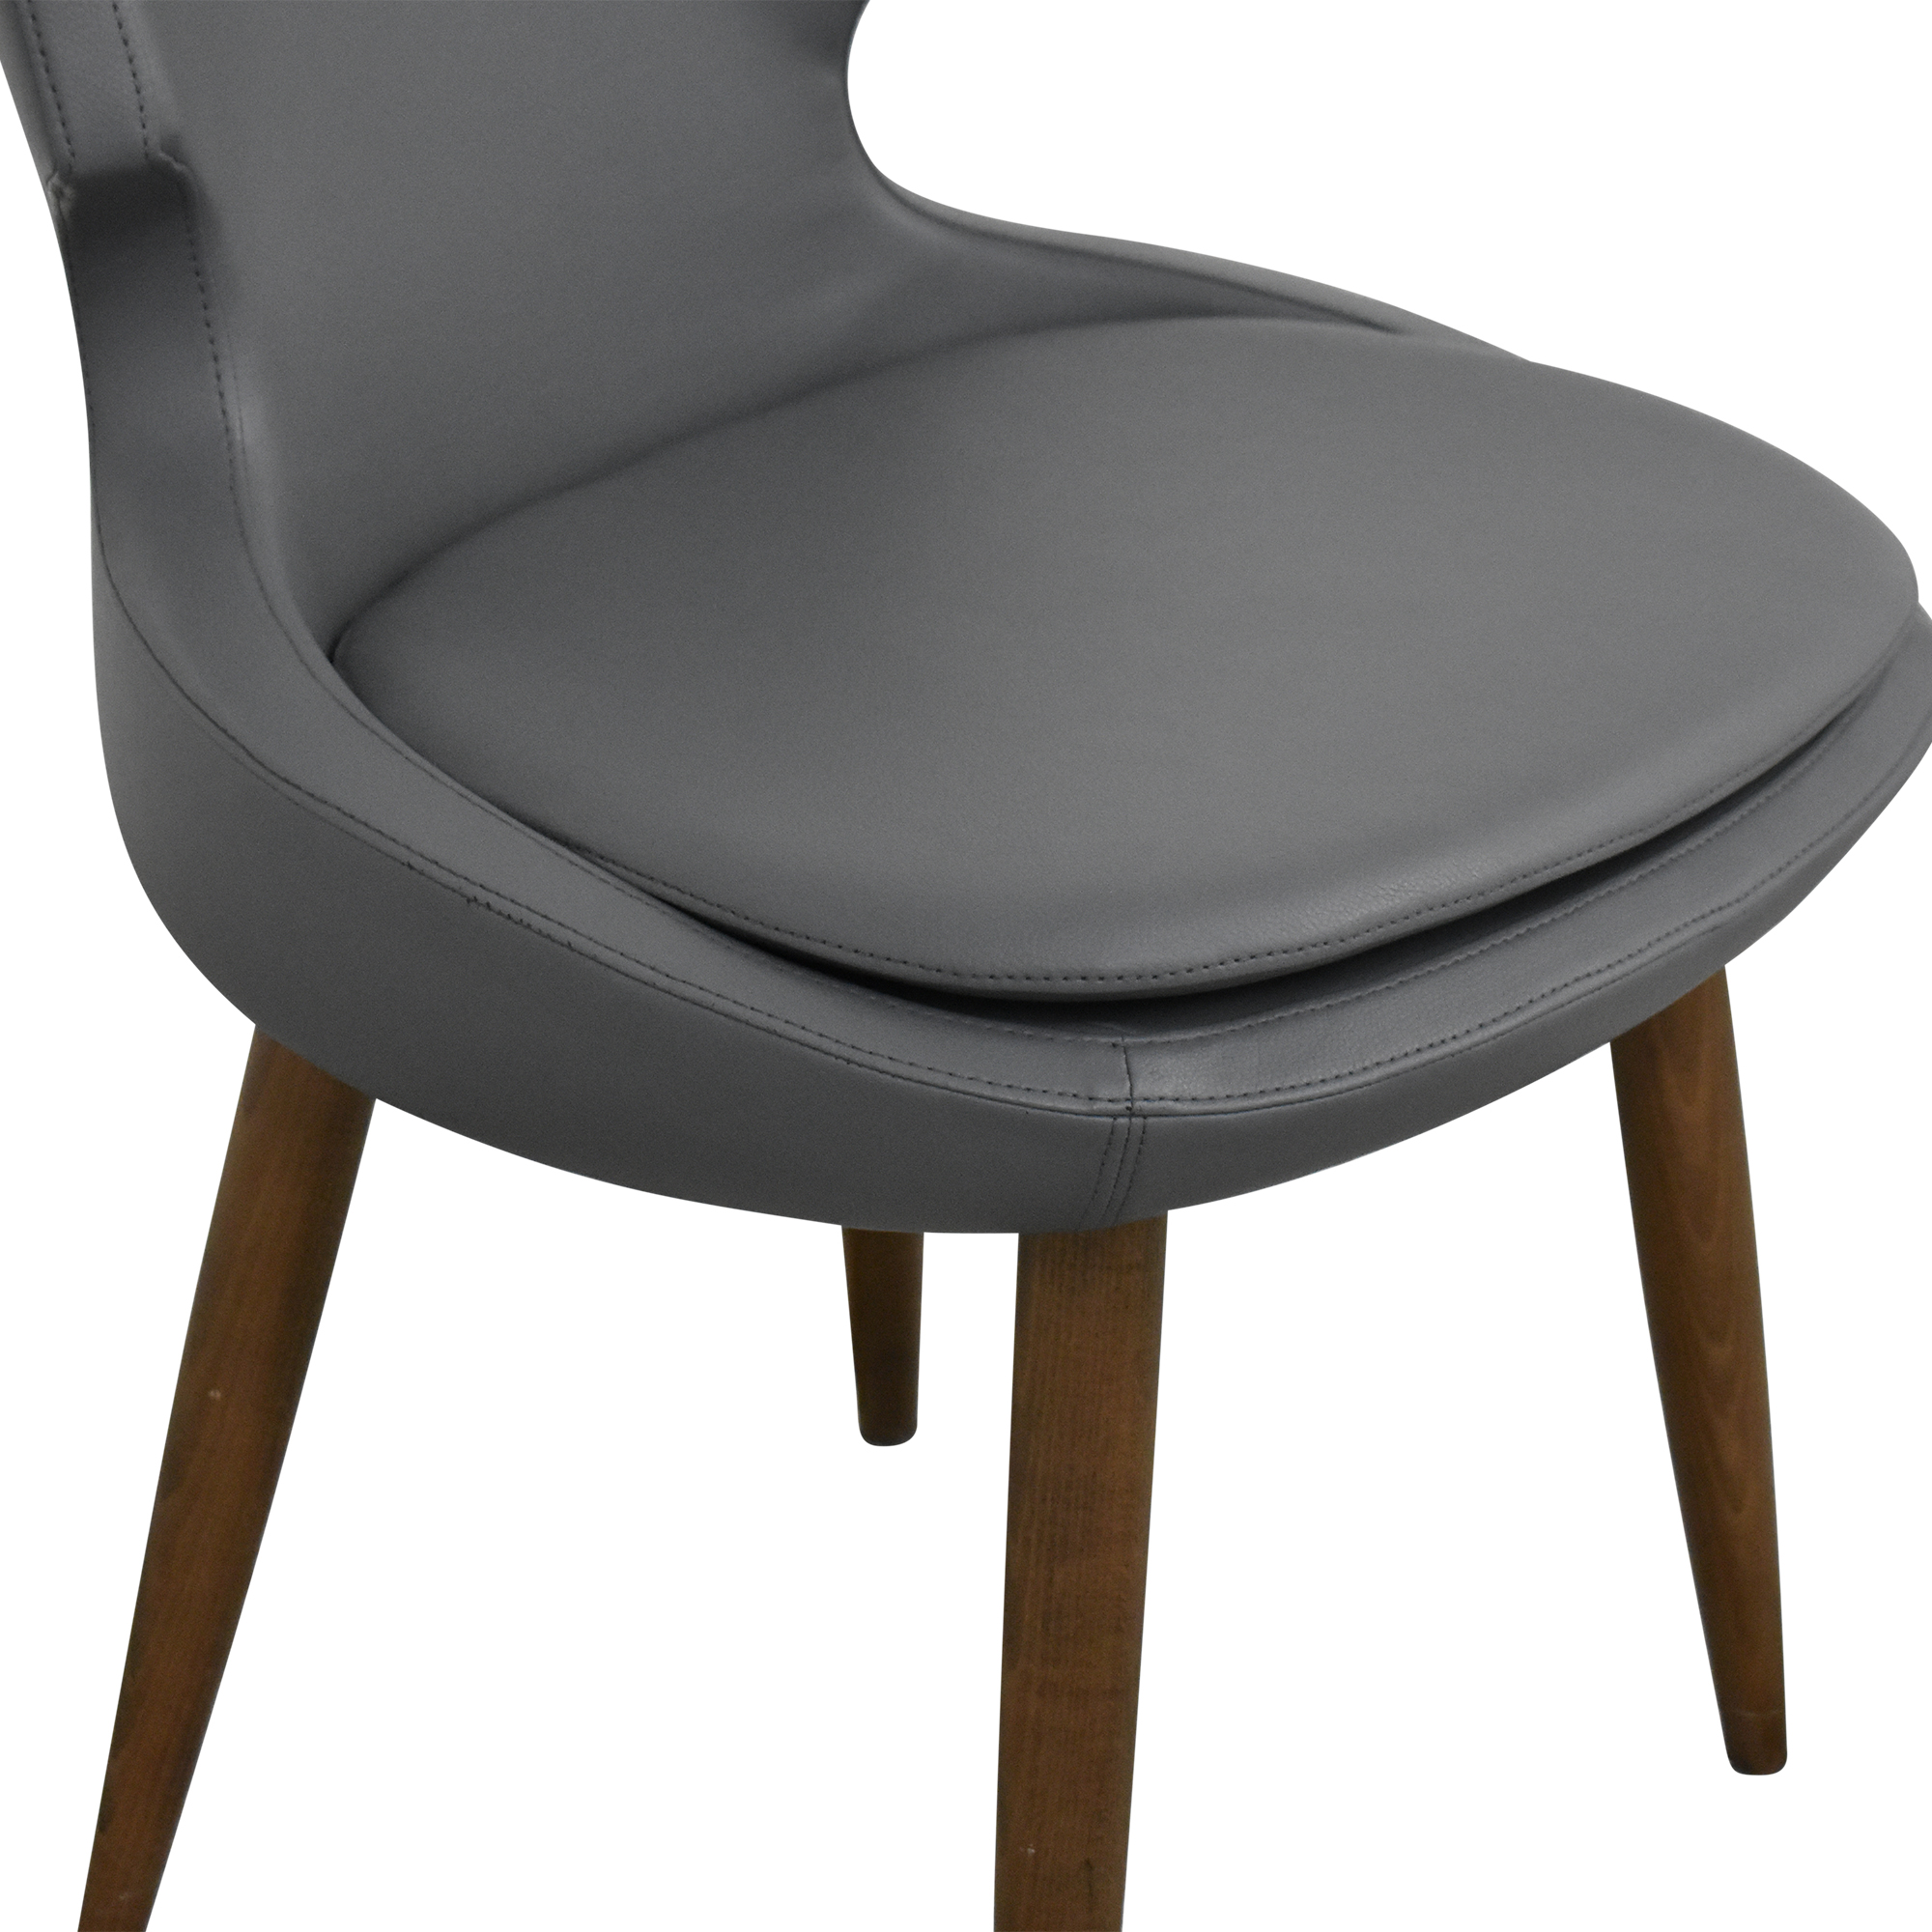 sohoConcept sohoConcept Patara Dining Chair coupon